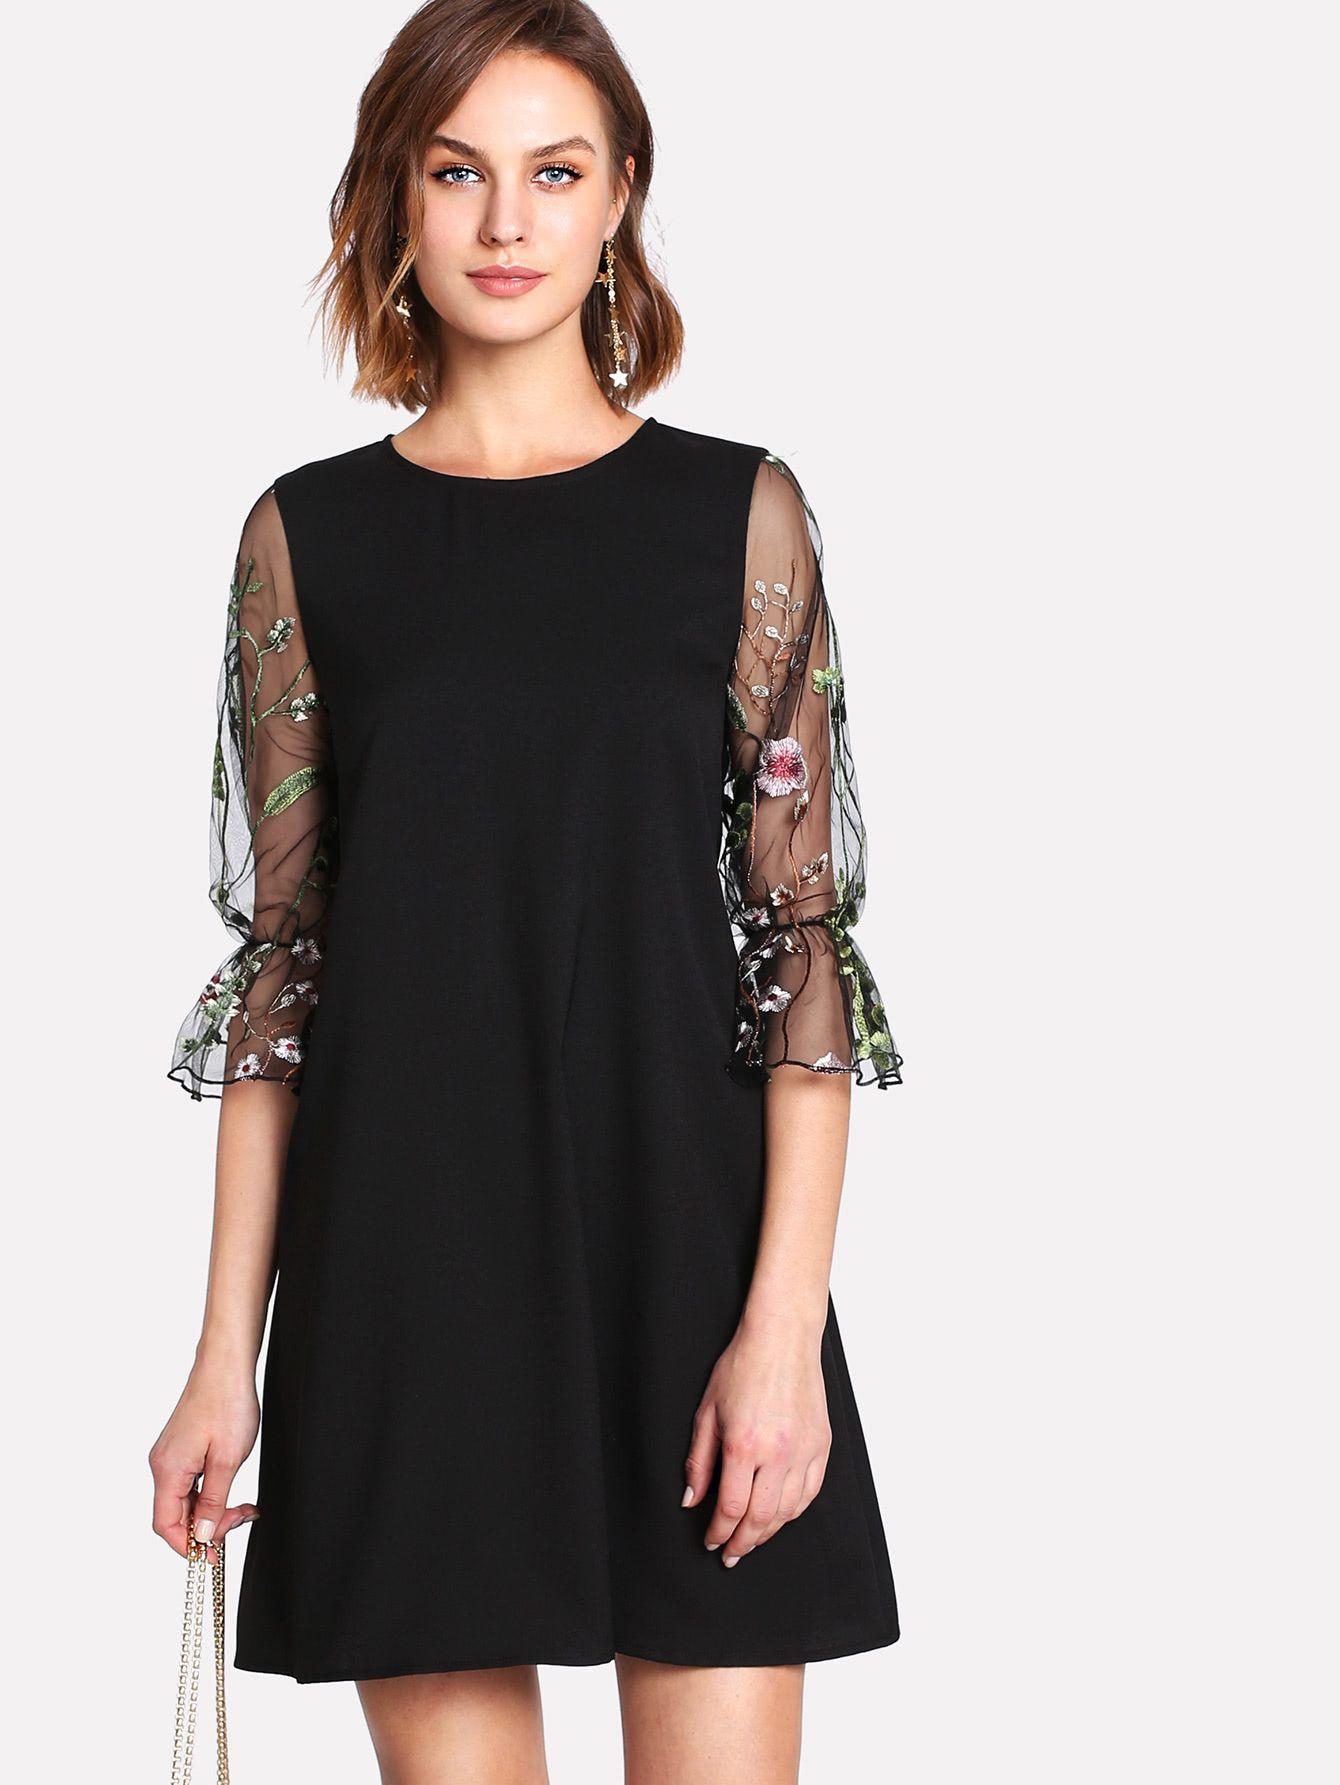 4b0f1d4a7b Shop Botanical Embroidery Mesh Flounce Sleeve Dress online. SheIn ...